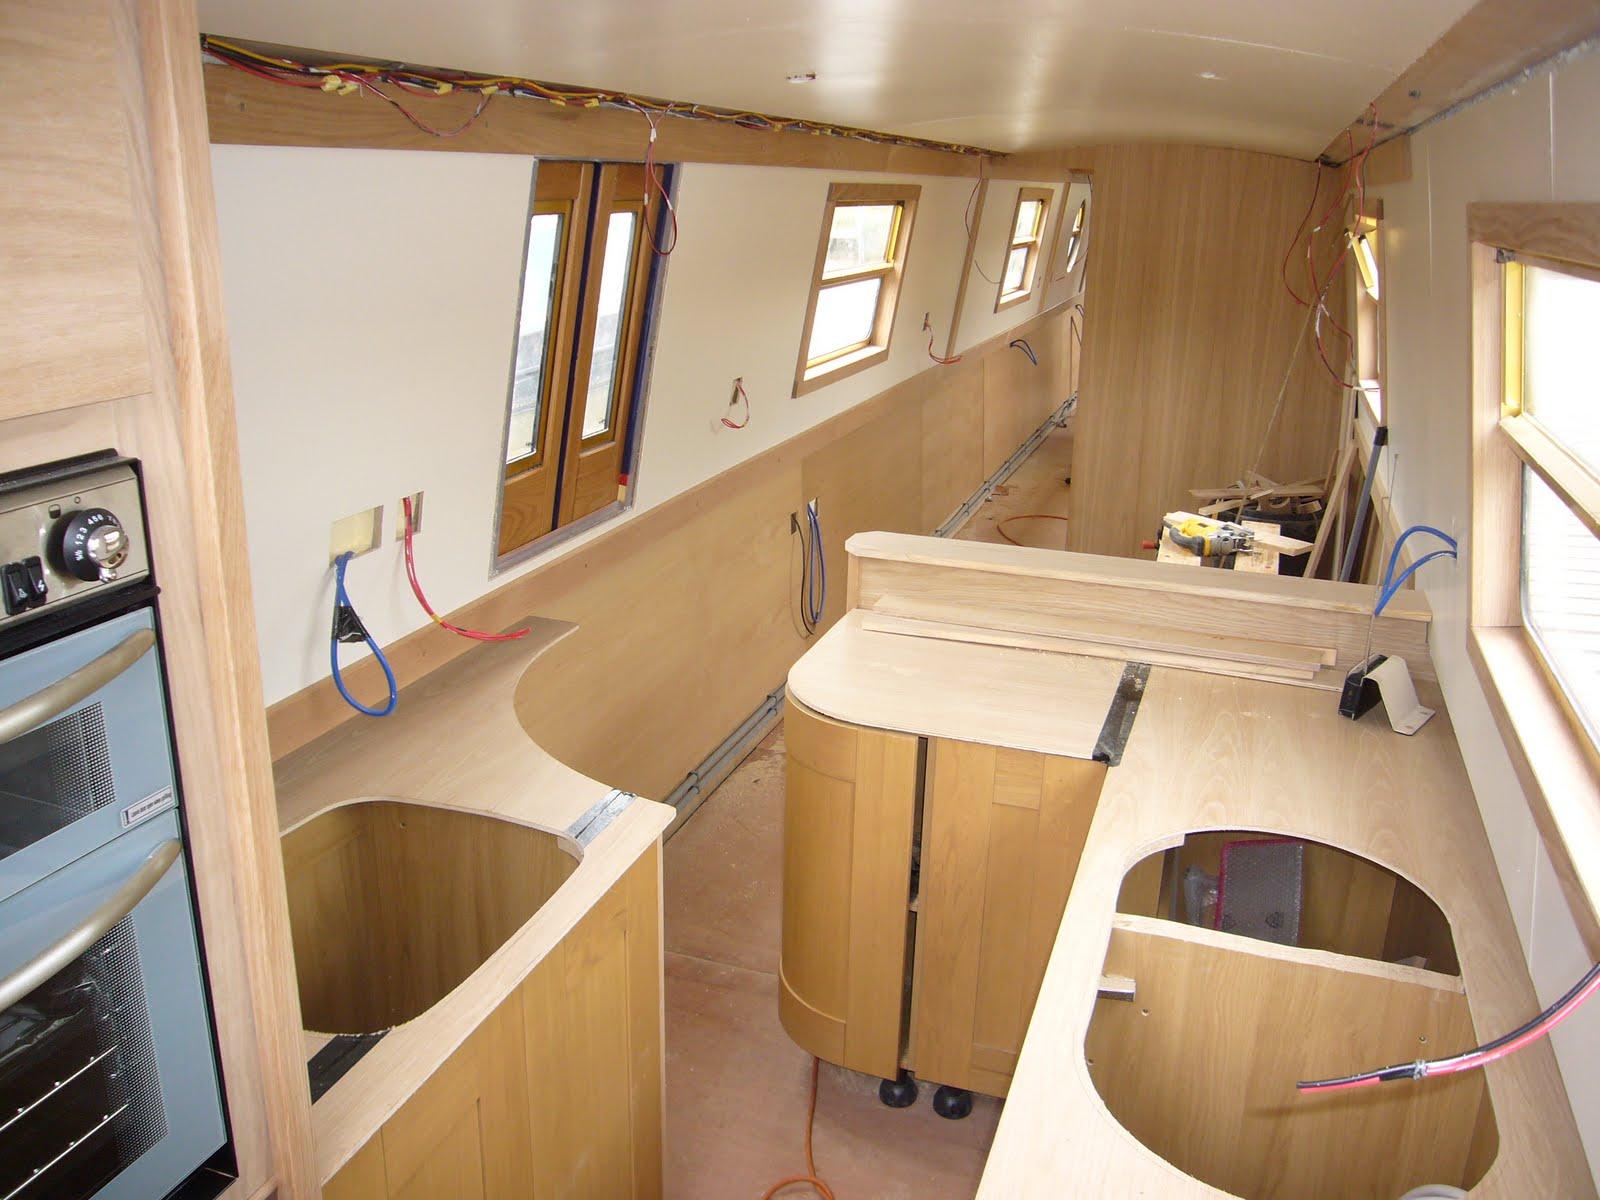 Aqua narrowboats welcome aqua bywyd sponsored hire boat no4 for Narrowboat interior designs